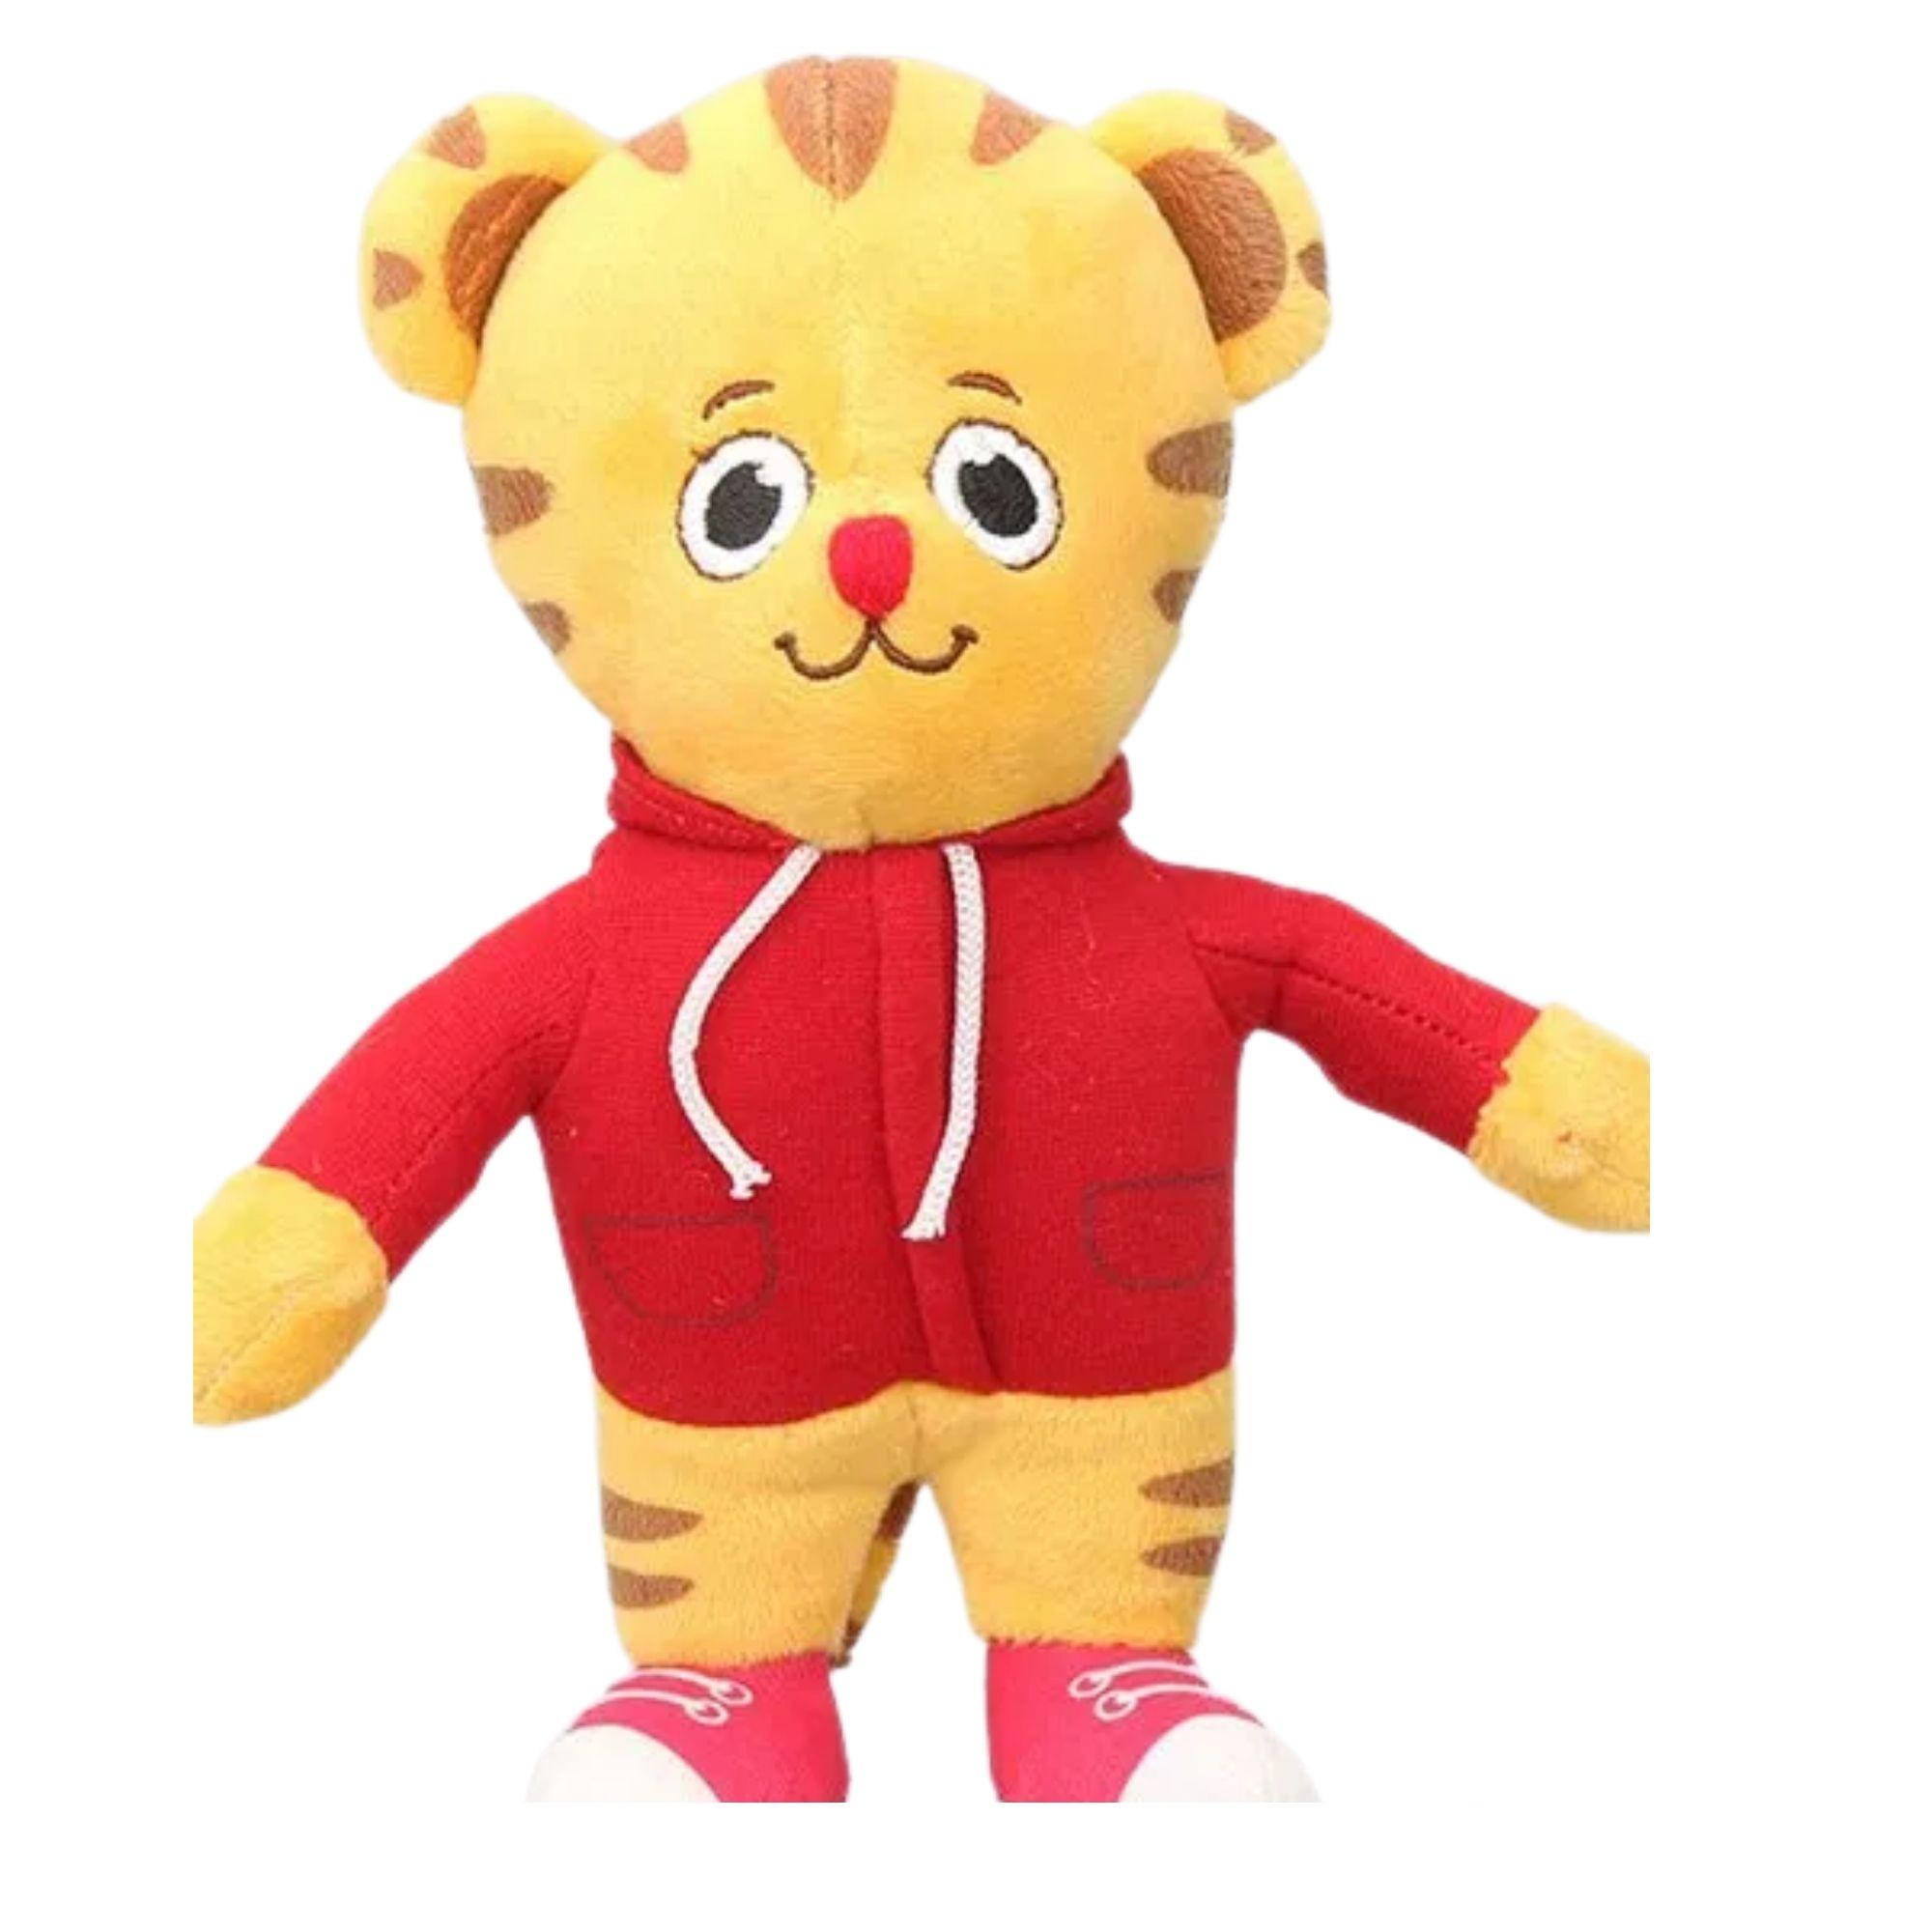 Boneco de Pelucia Daniel Tiger   - Game Land Brinquedos